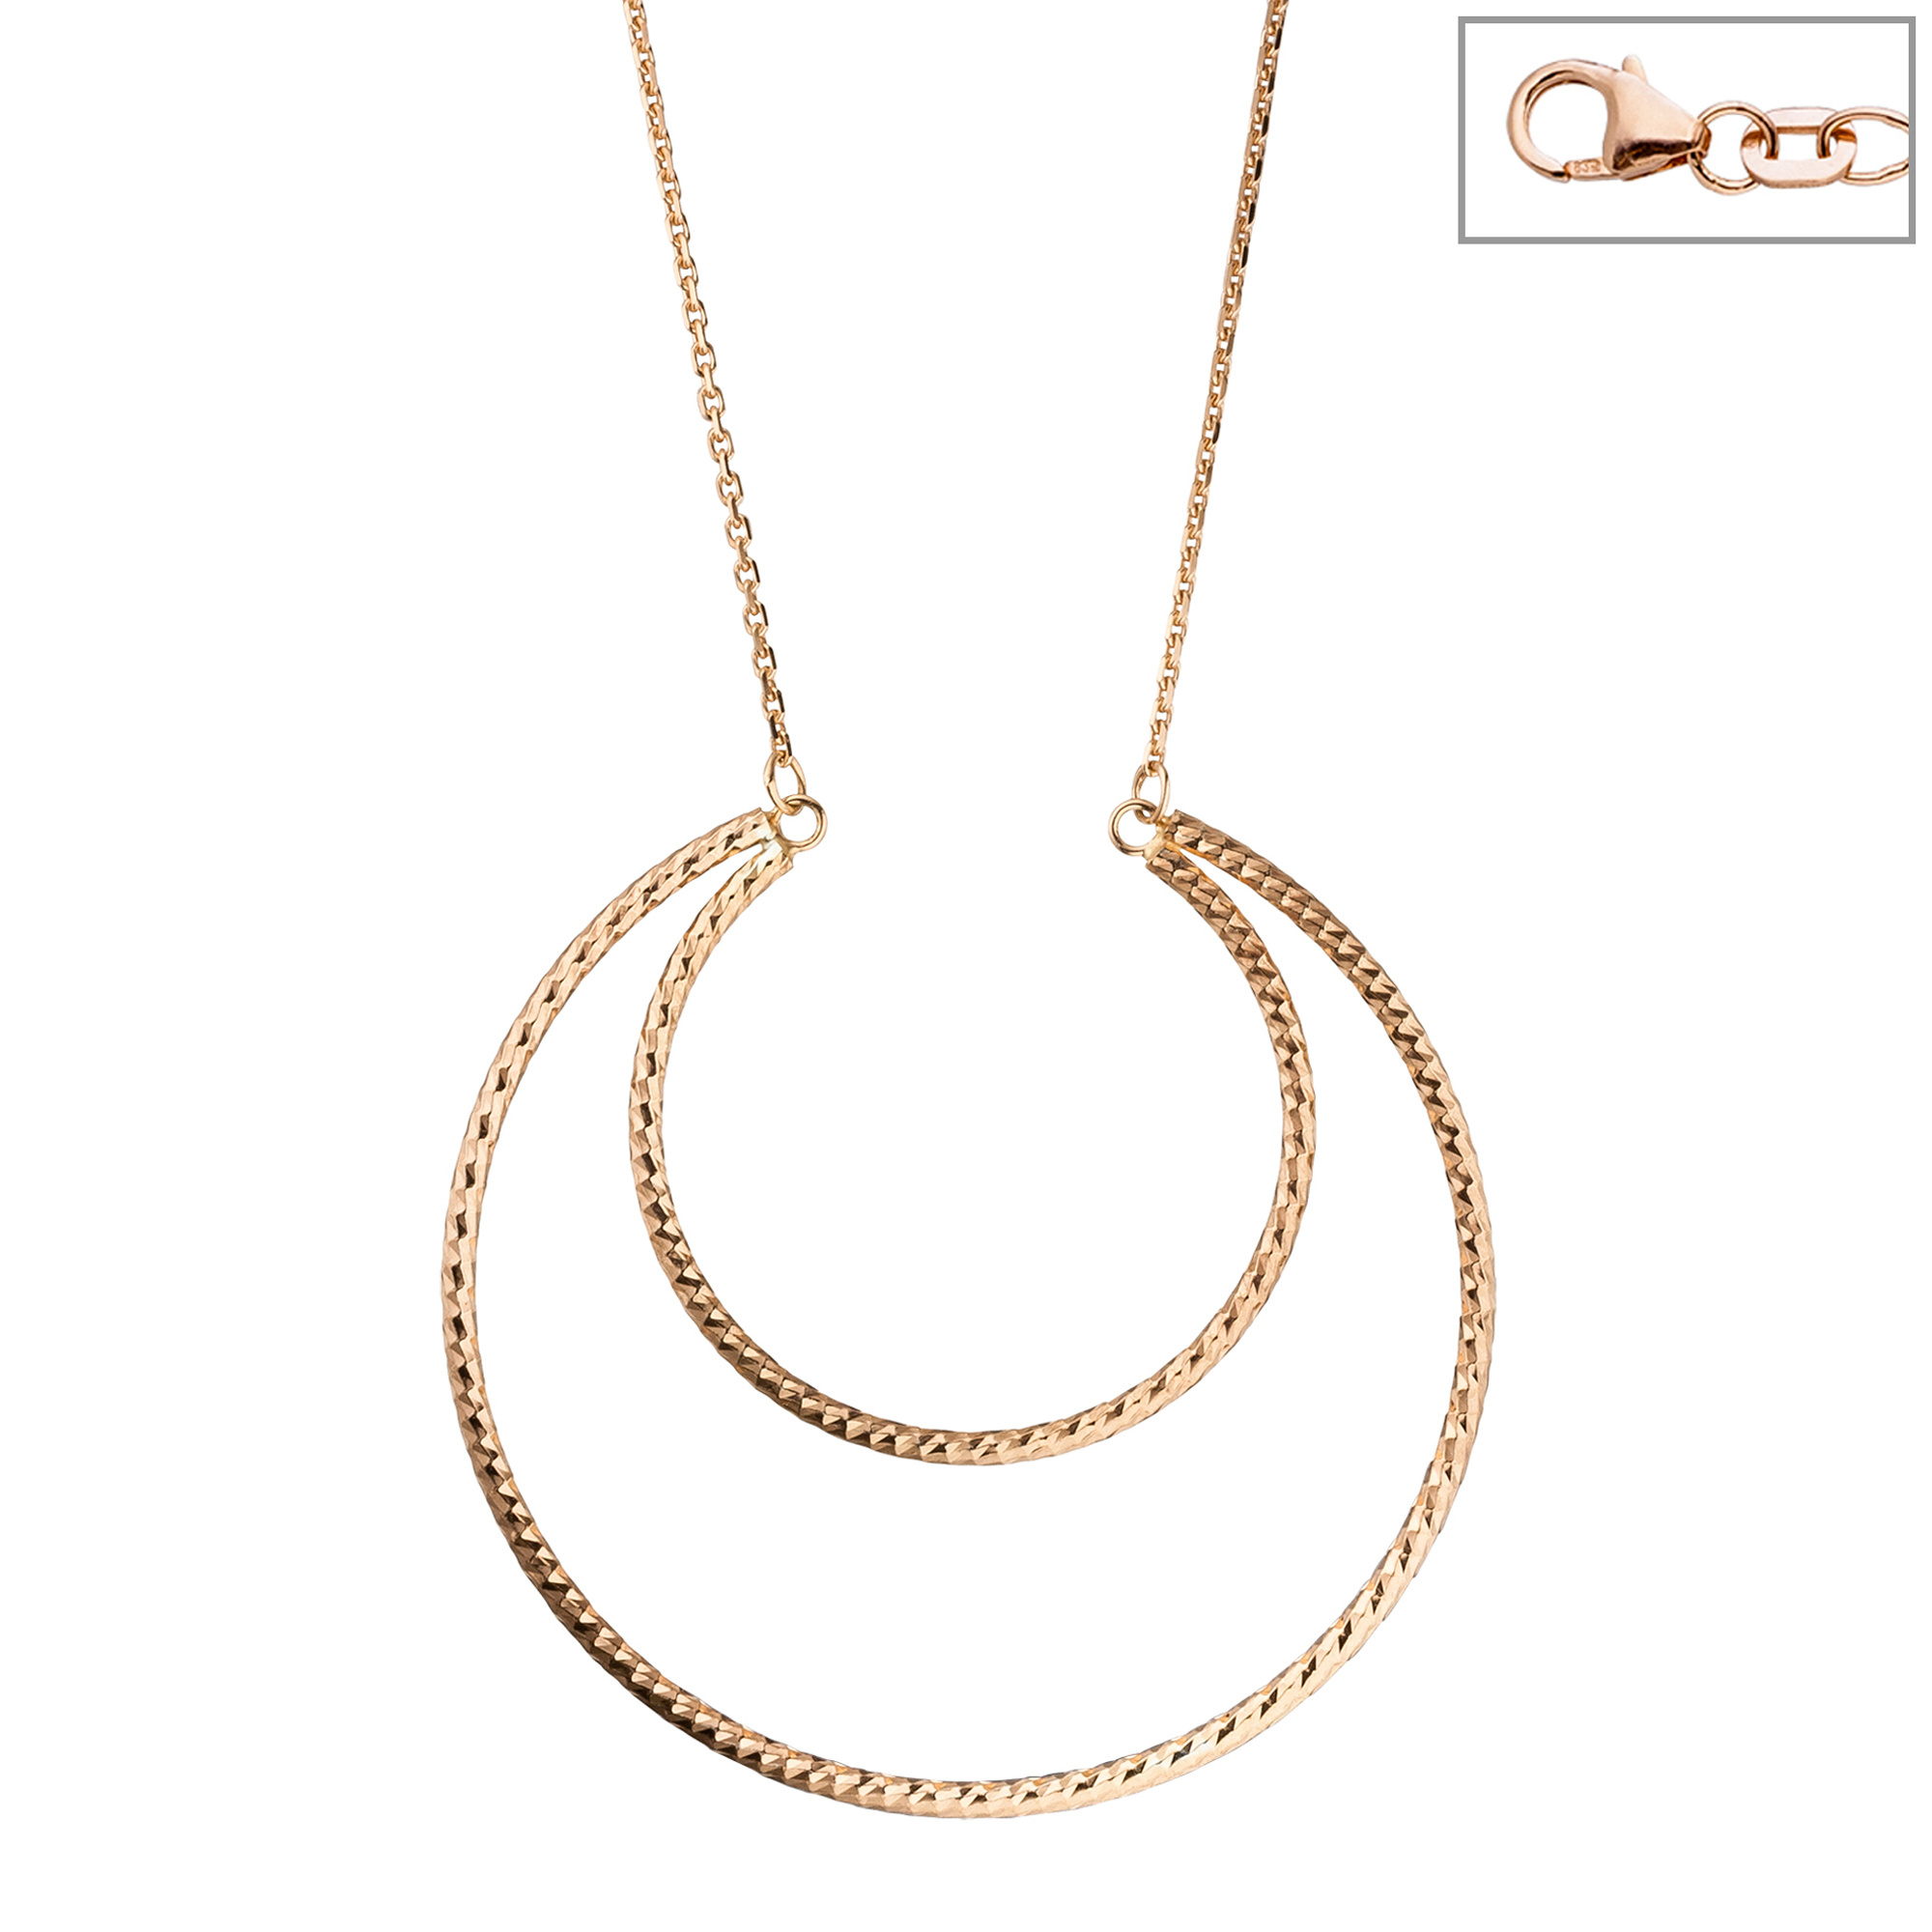 Collier Halskette 925 Sterling Silber rotgold vergoldet 46 cm Kette 1 ... e520b399a4